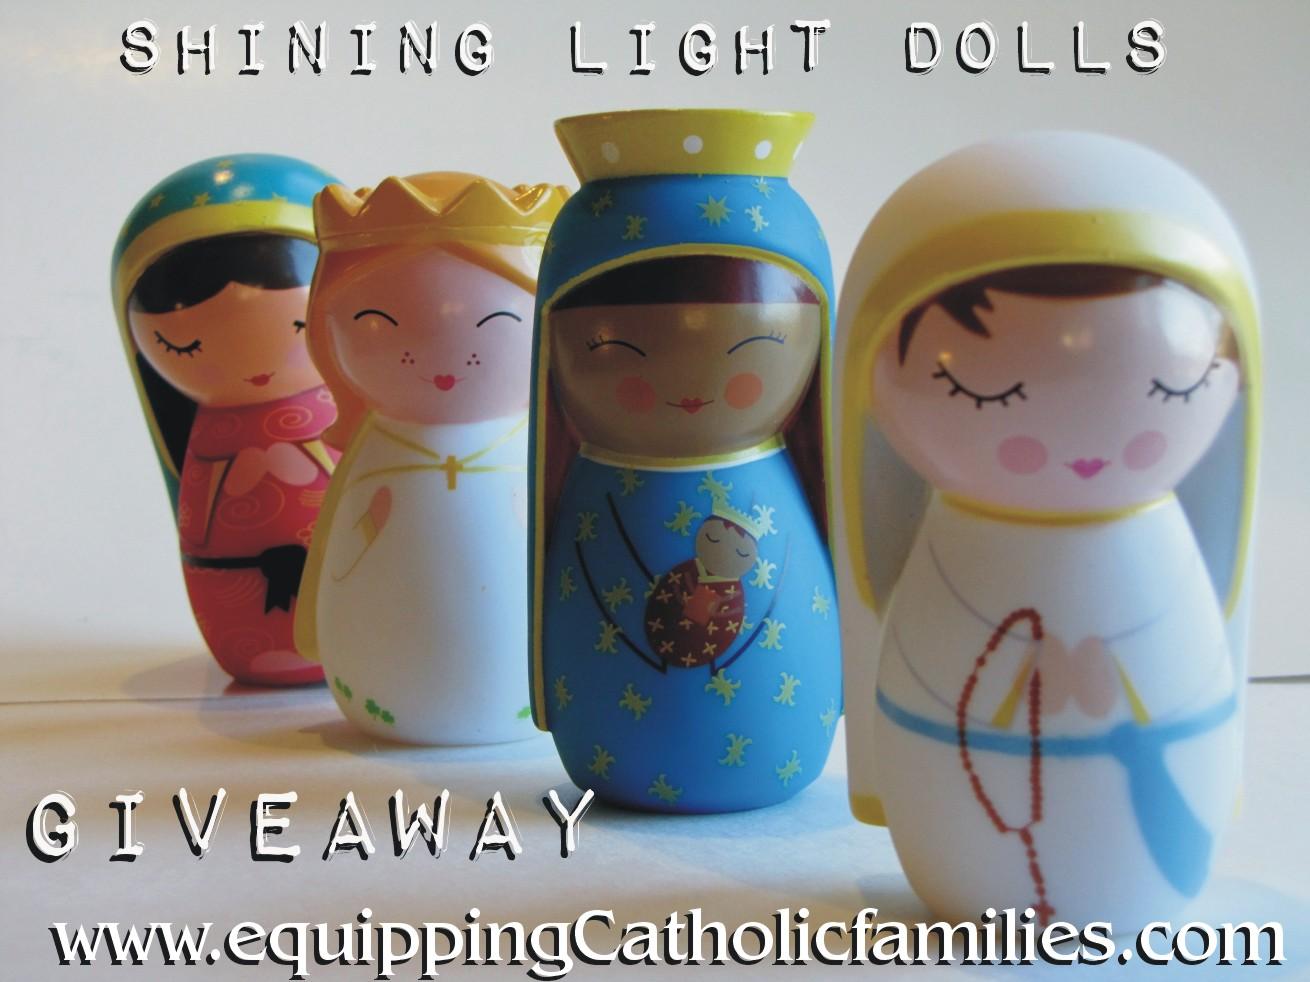 Shining Light Dolls: GIVEAWAY!